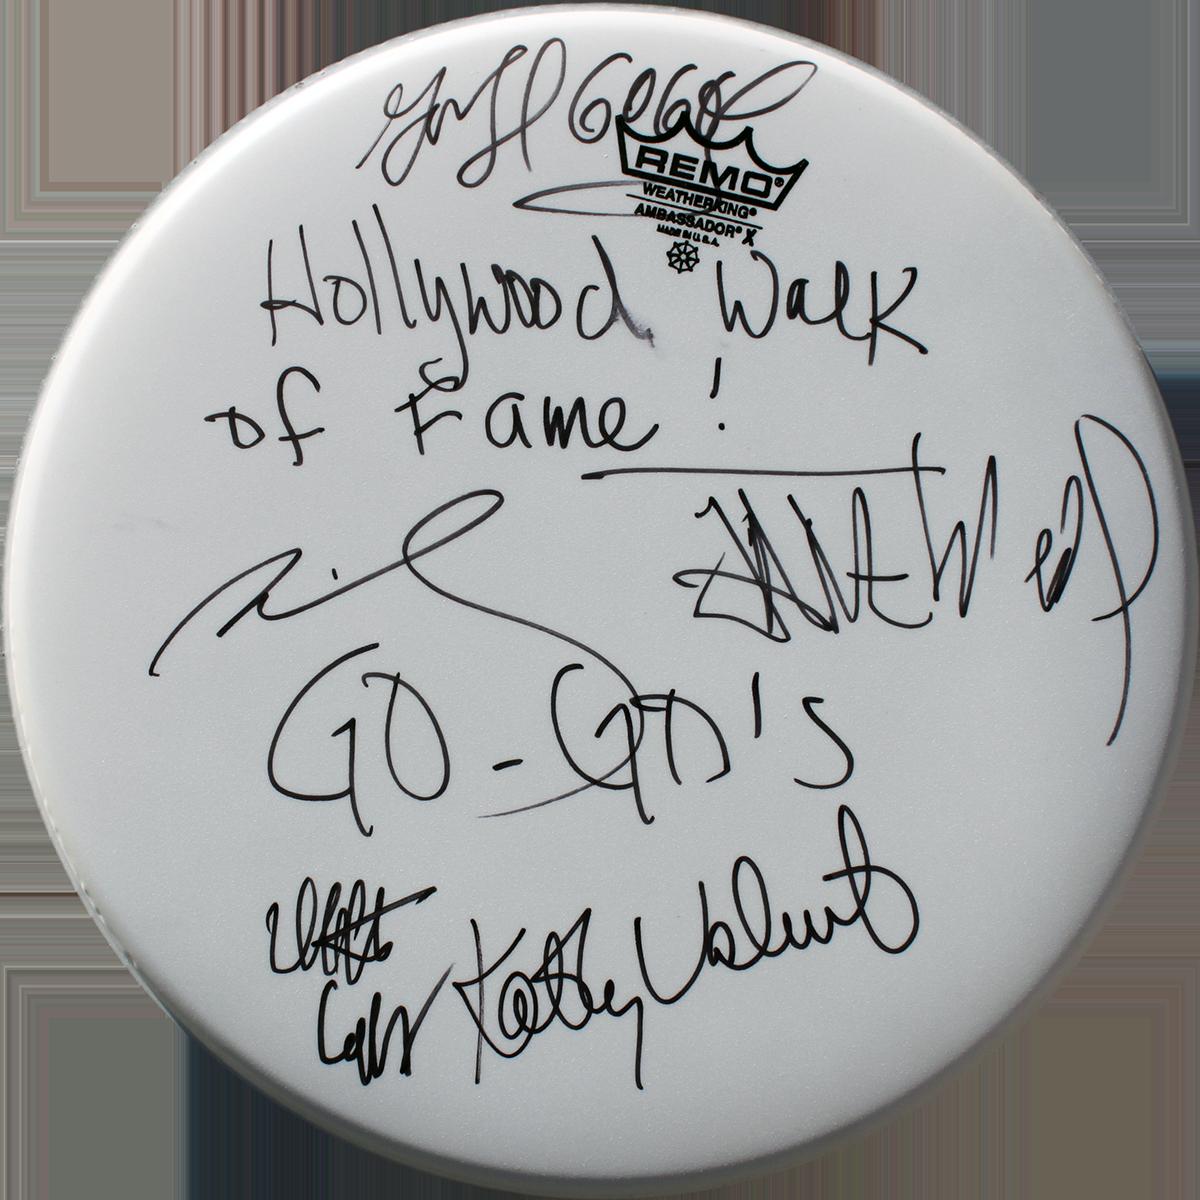 Drumhead - Go-Go's